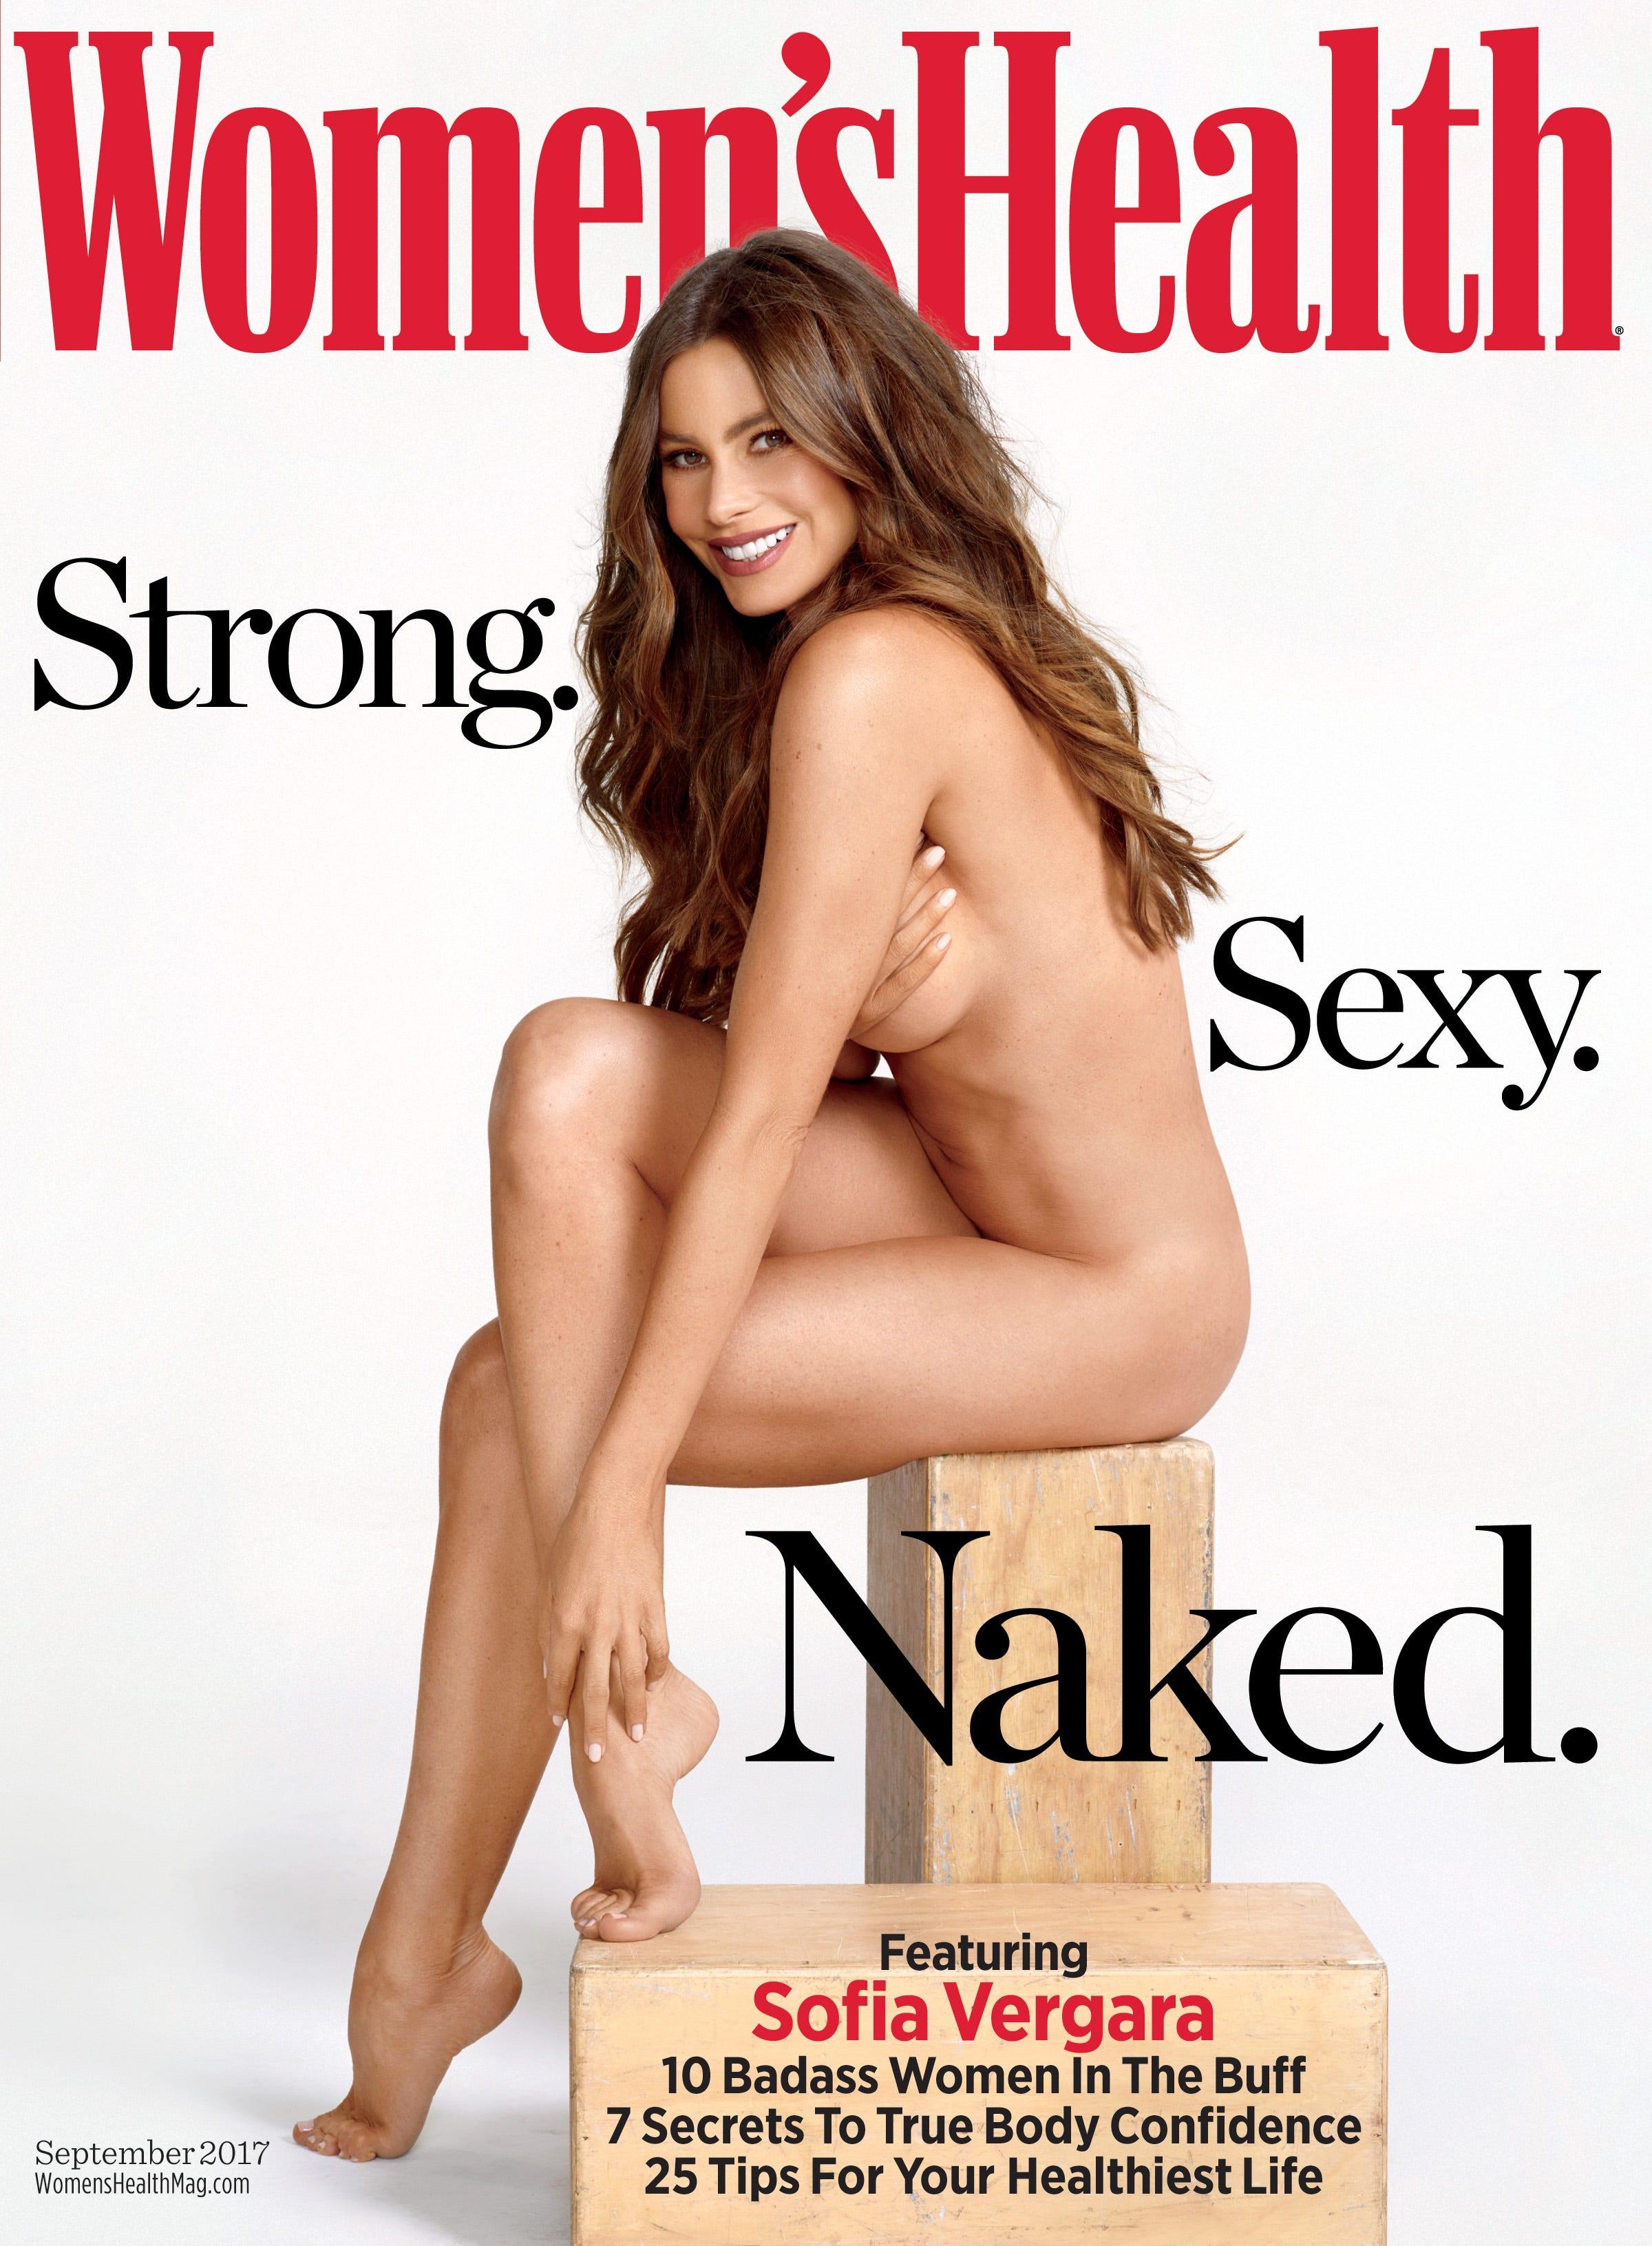 Sofia vergara totally nude